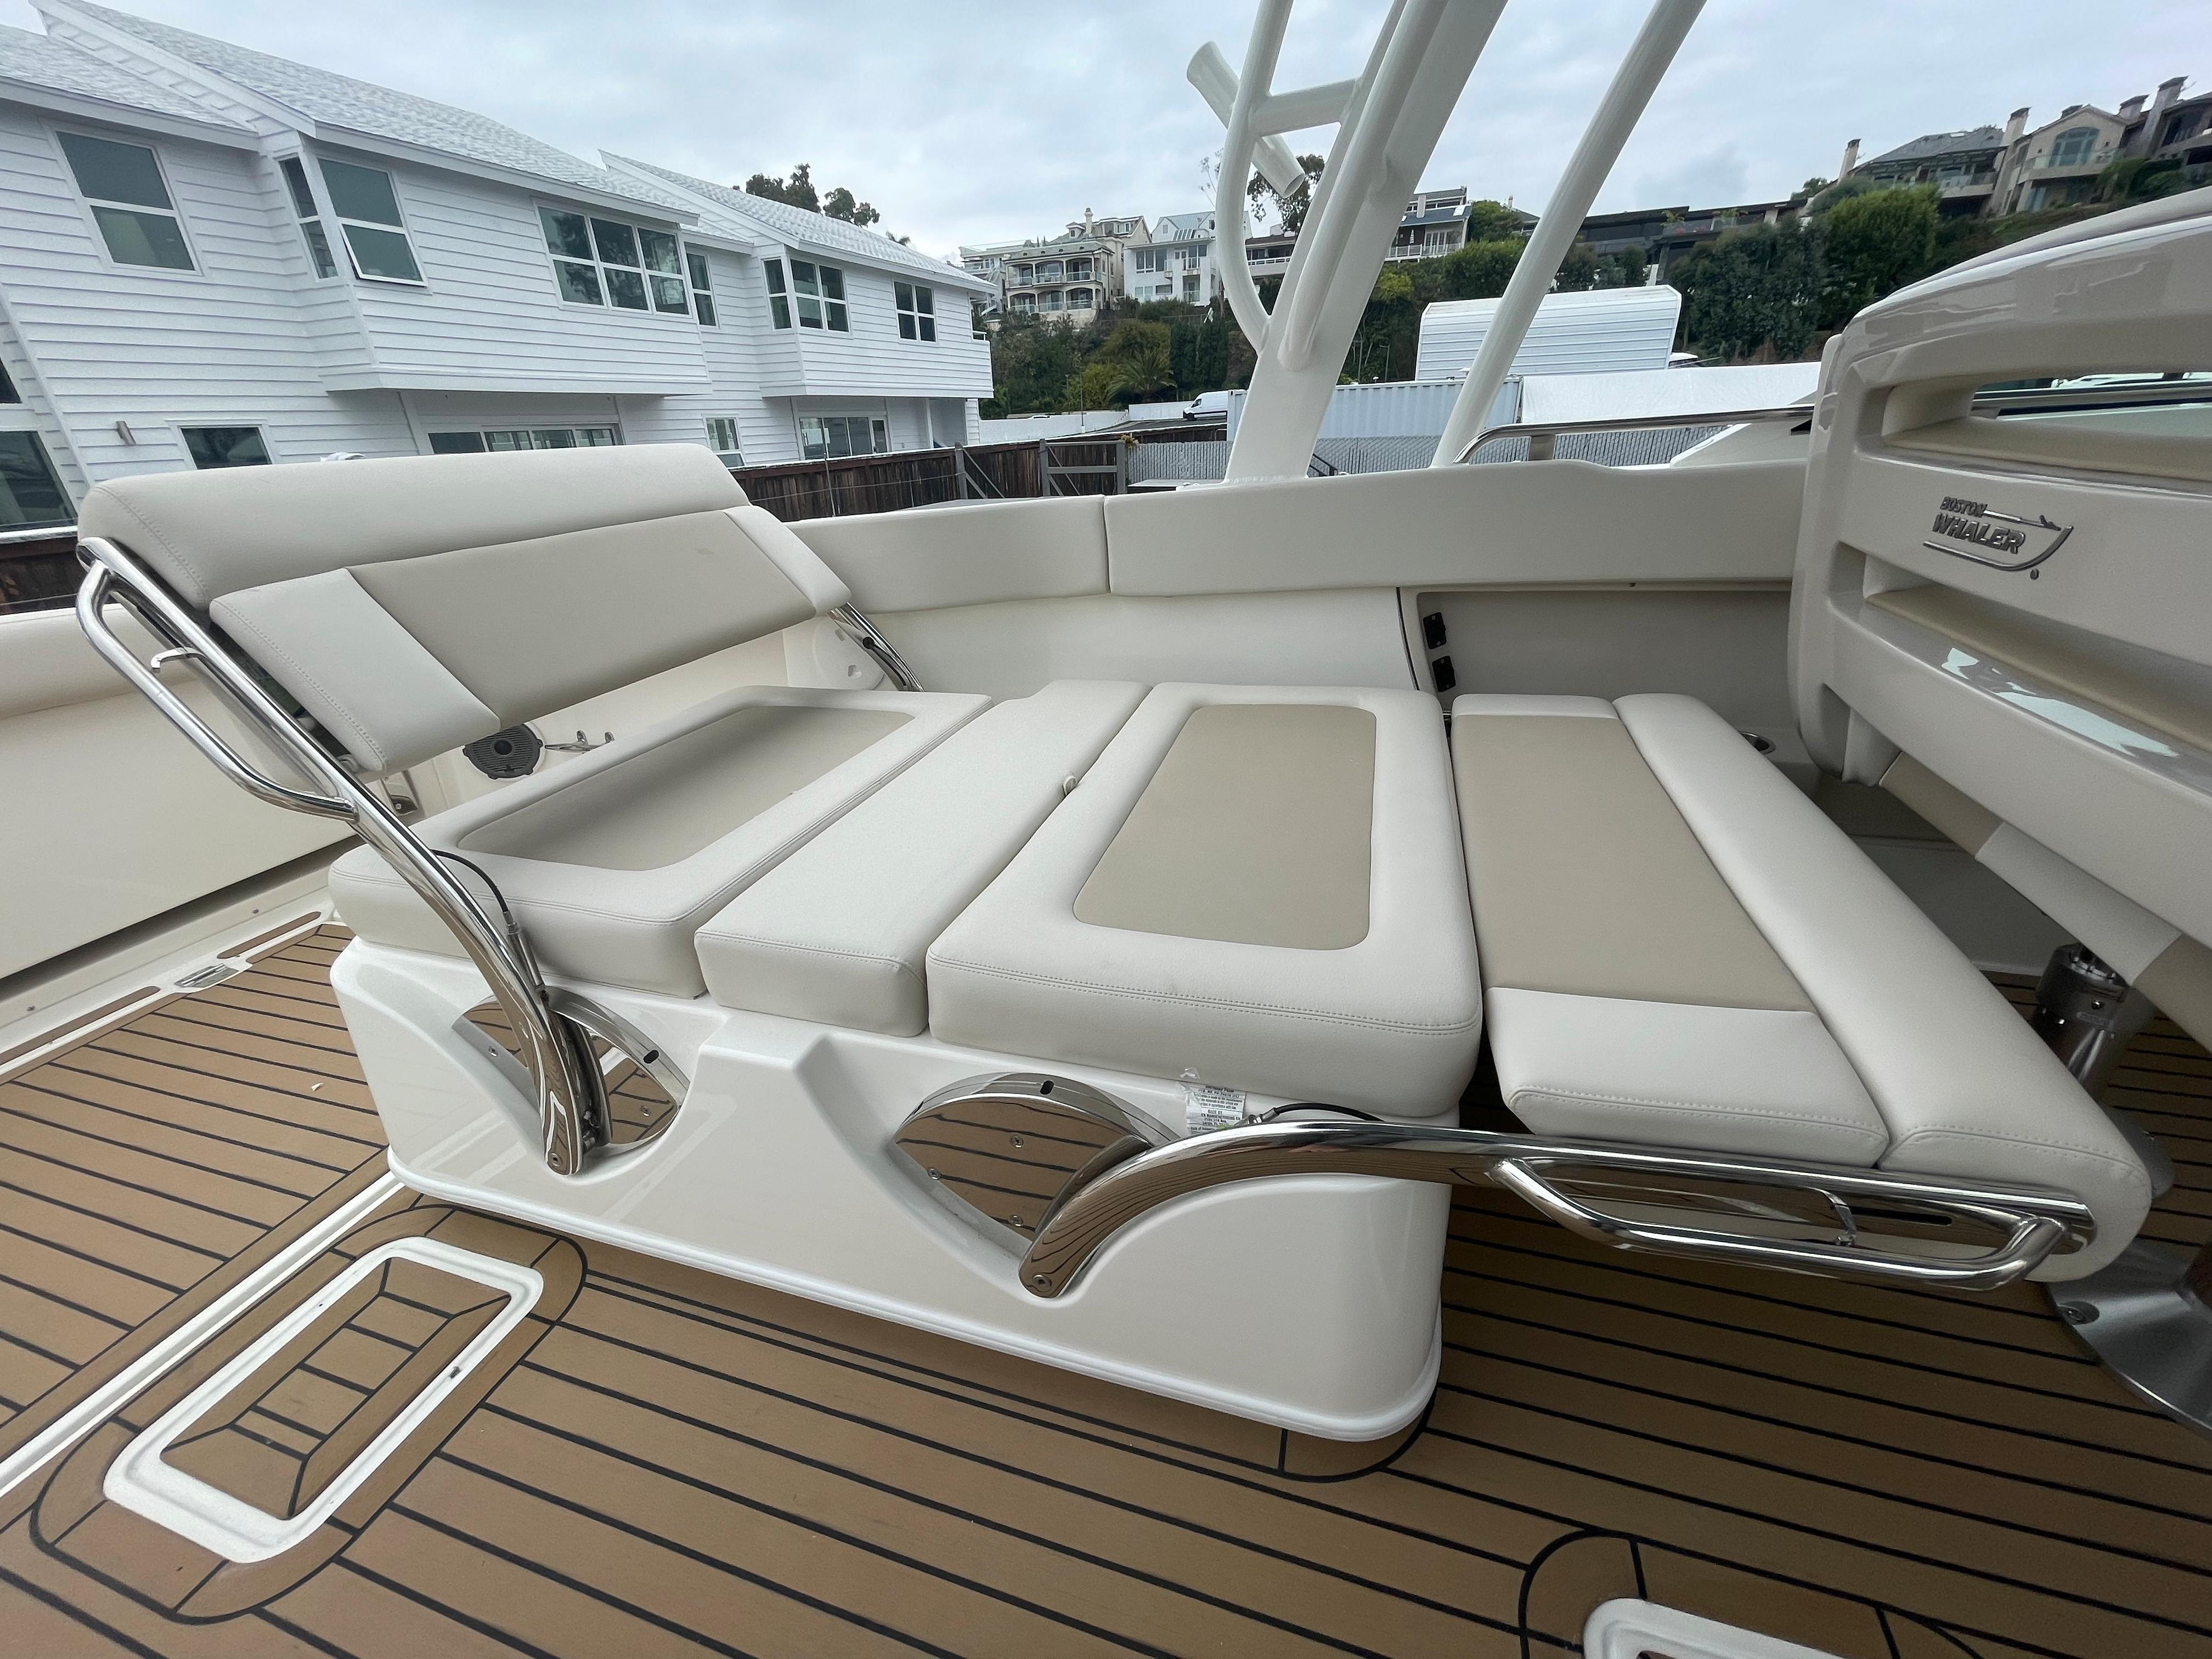 2022 Boston Whaler 320 Vantage #BW0118F inventory image at Sun Country Coastal in Newport Beach